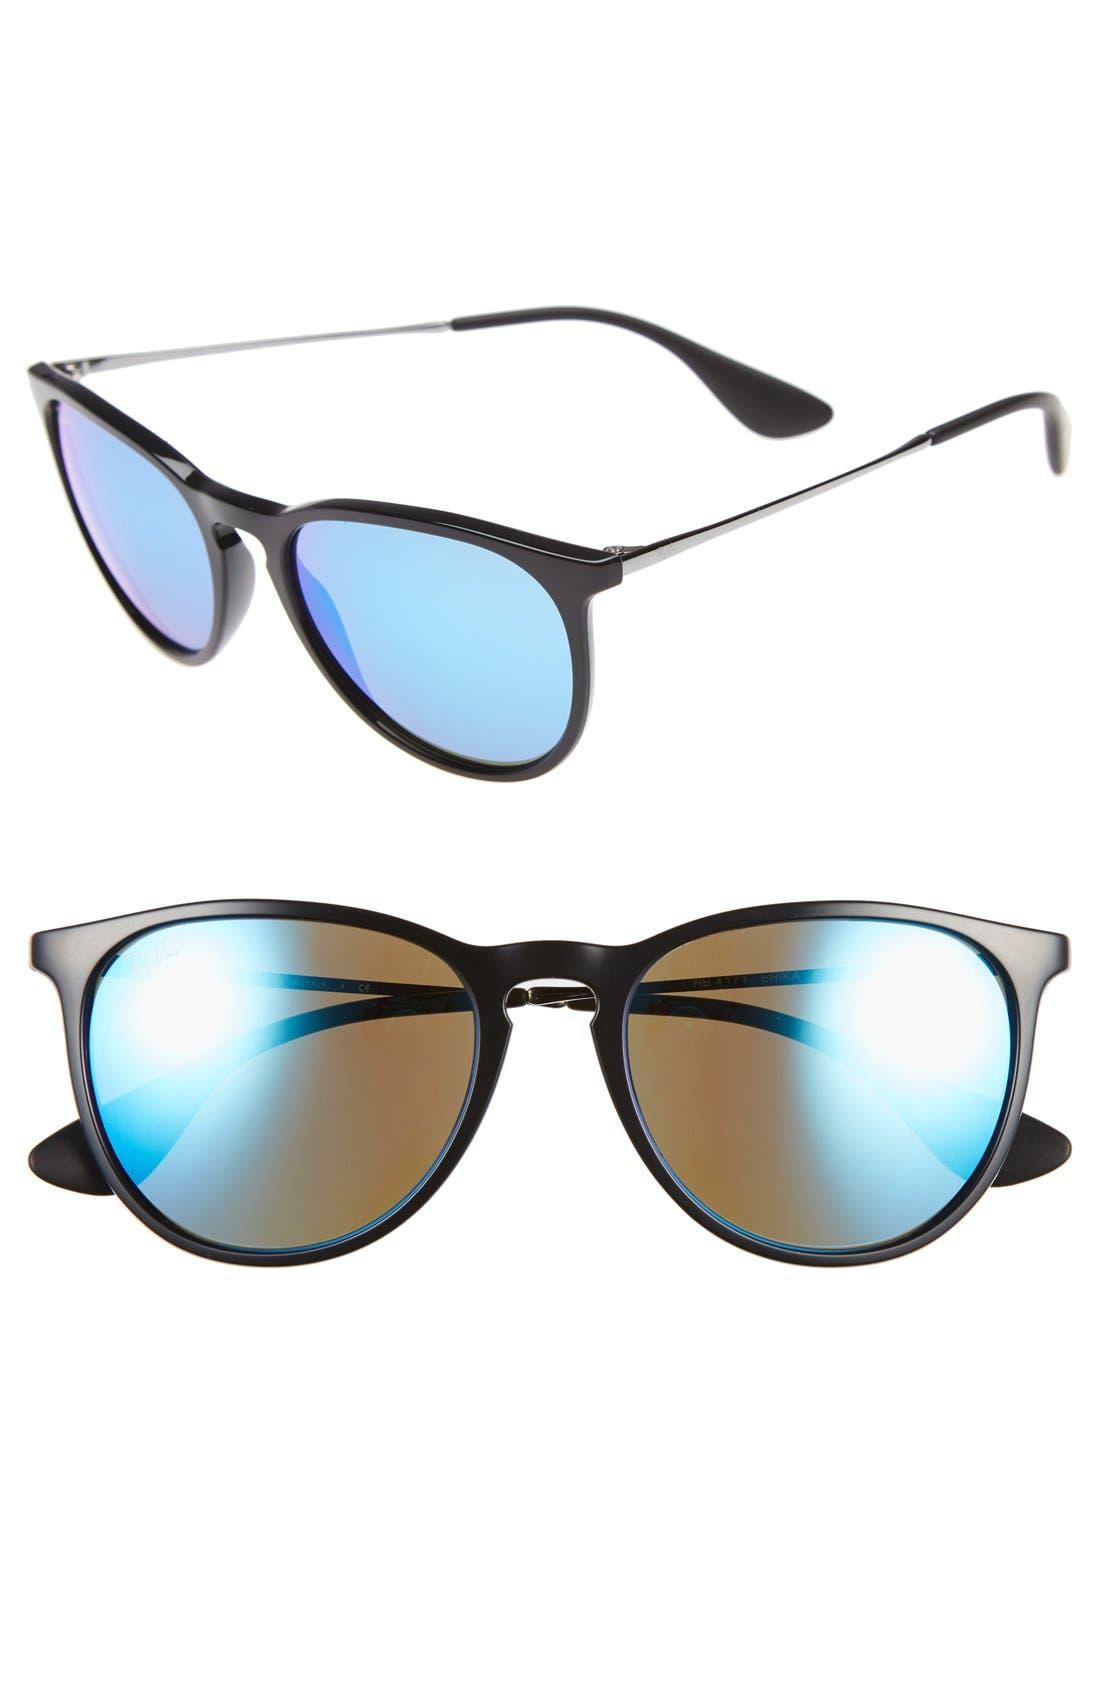 Alternate Image 1 Selected - Ray-Ban Erika Classic 54mm Sunglasses